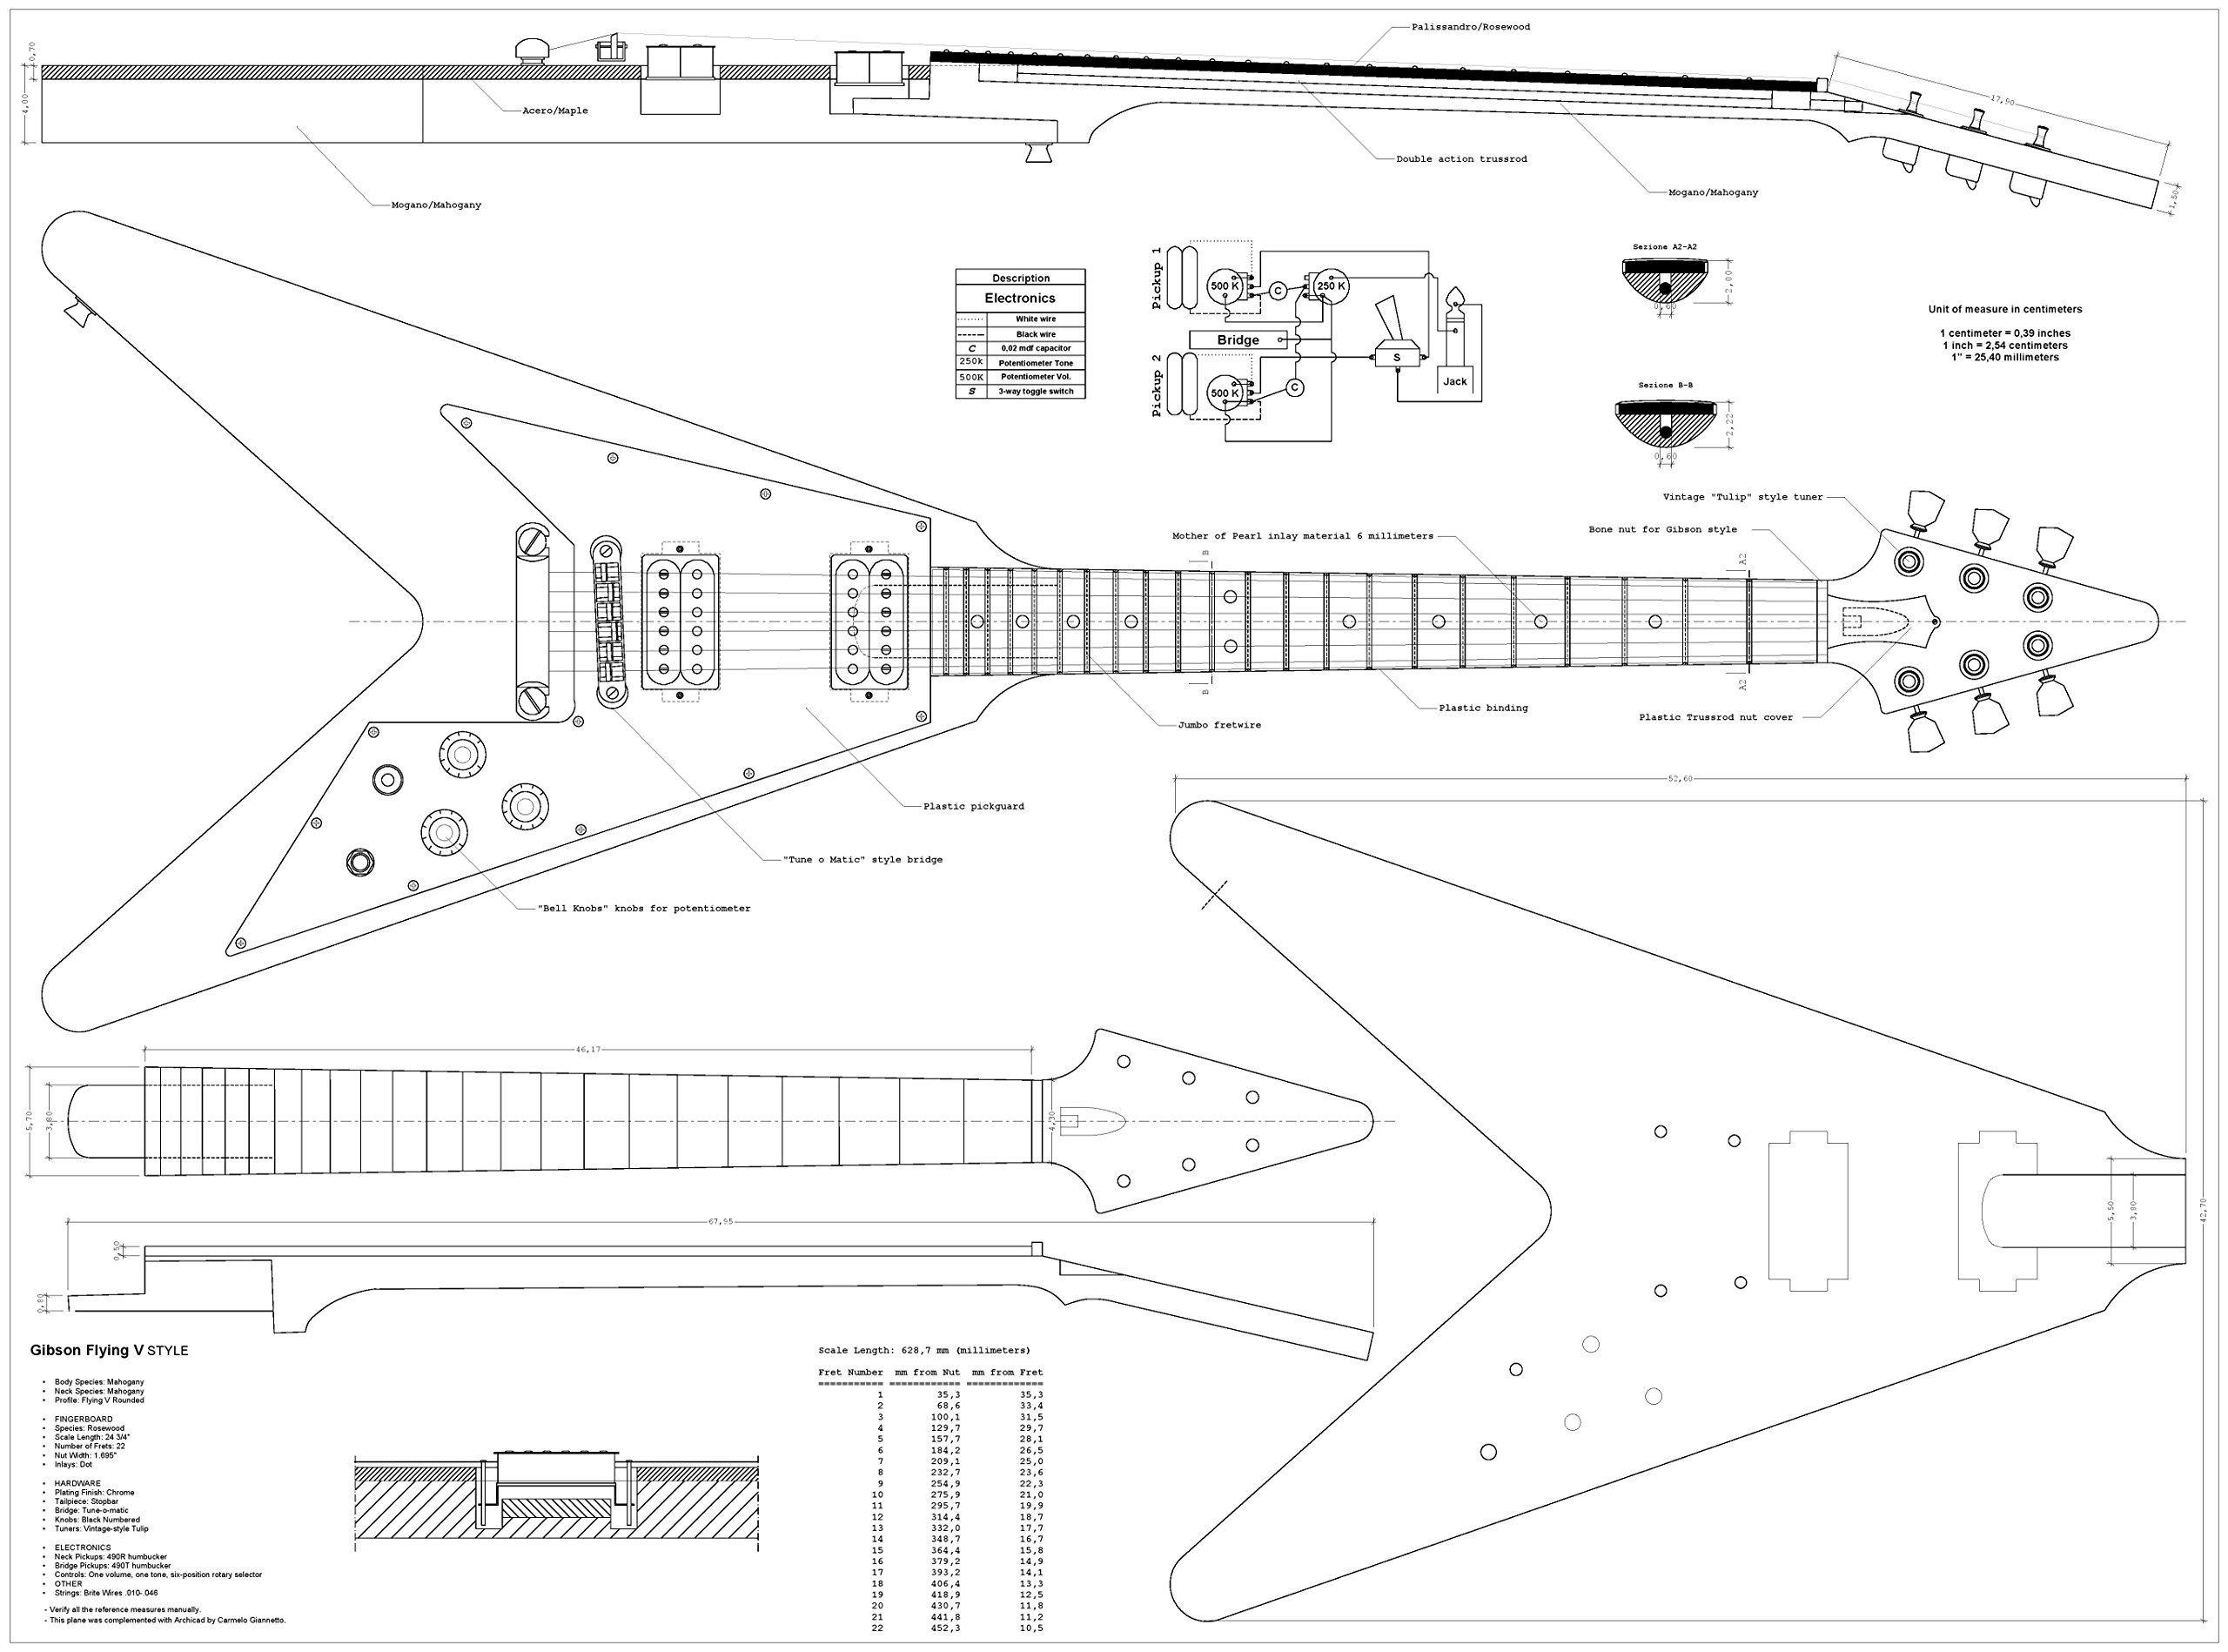 Set Of 4 Electric Guitar Plans - Gibson Flying - V, Gibson Explorer - Es 335 Wiring Diagram